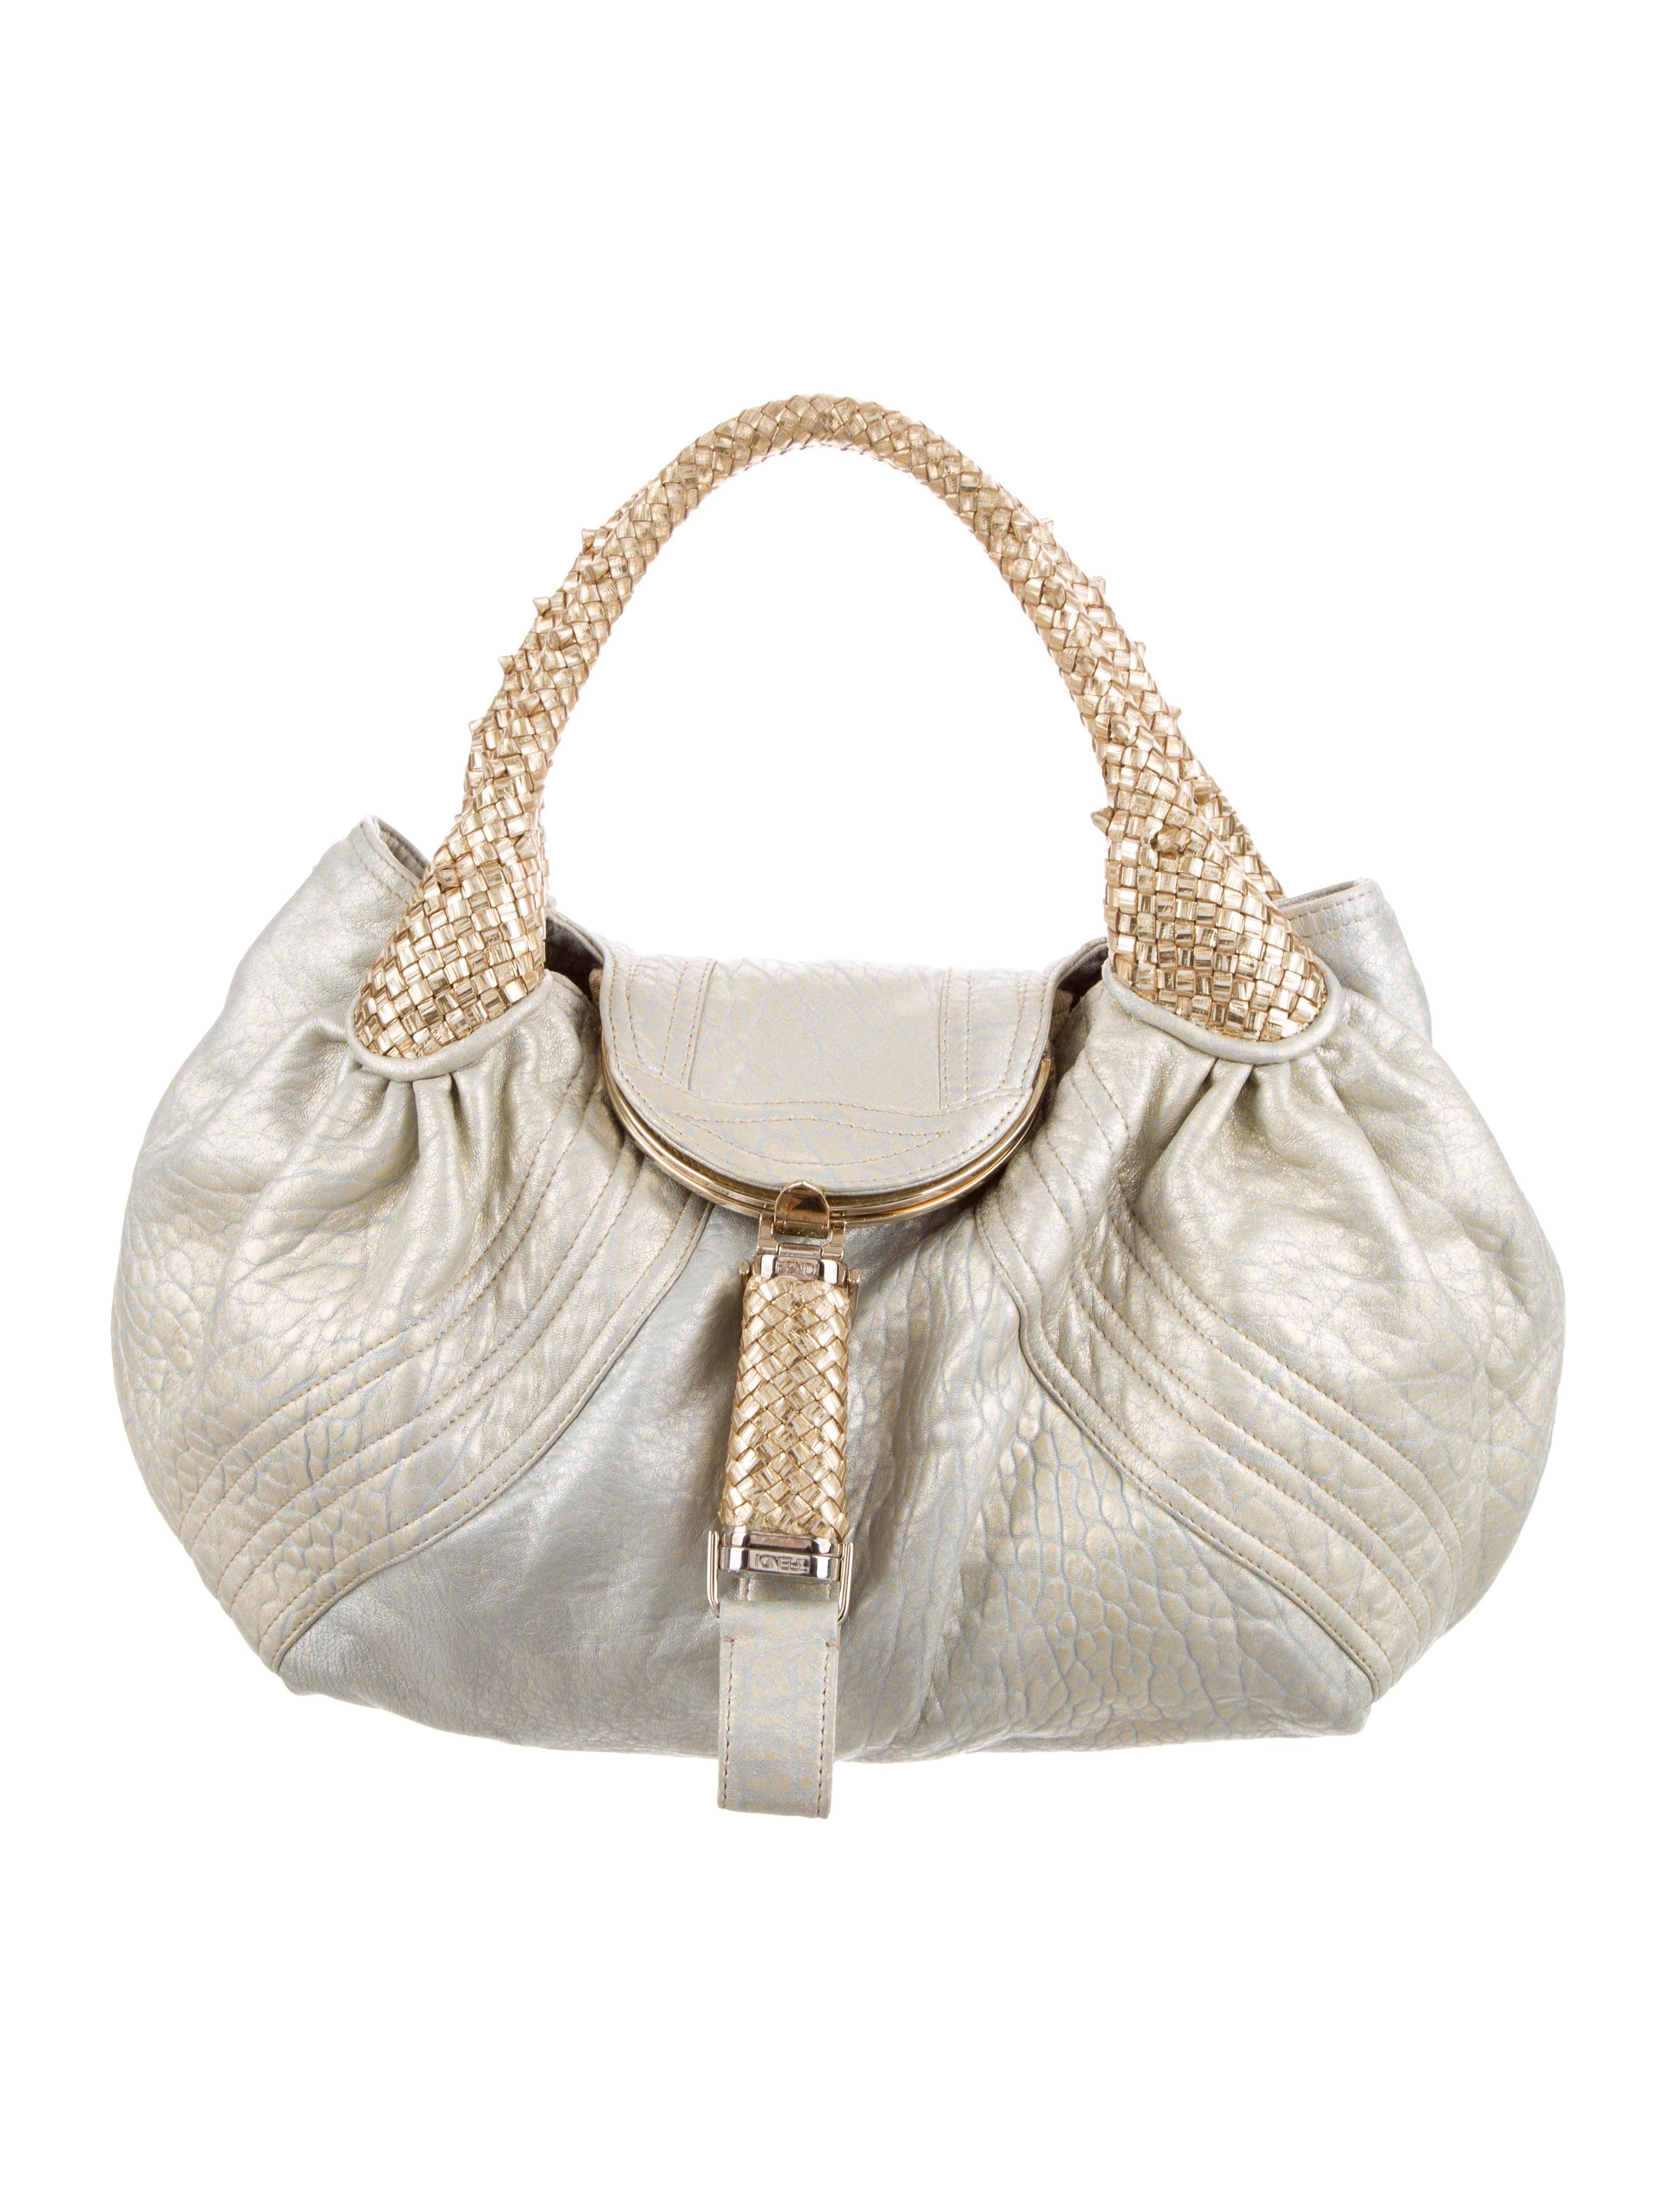 bfe8960af0e1 Fendi Metallic Spy Bag - Handbags - FEN93649